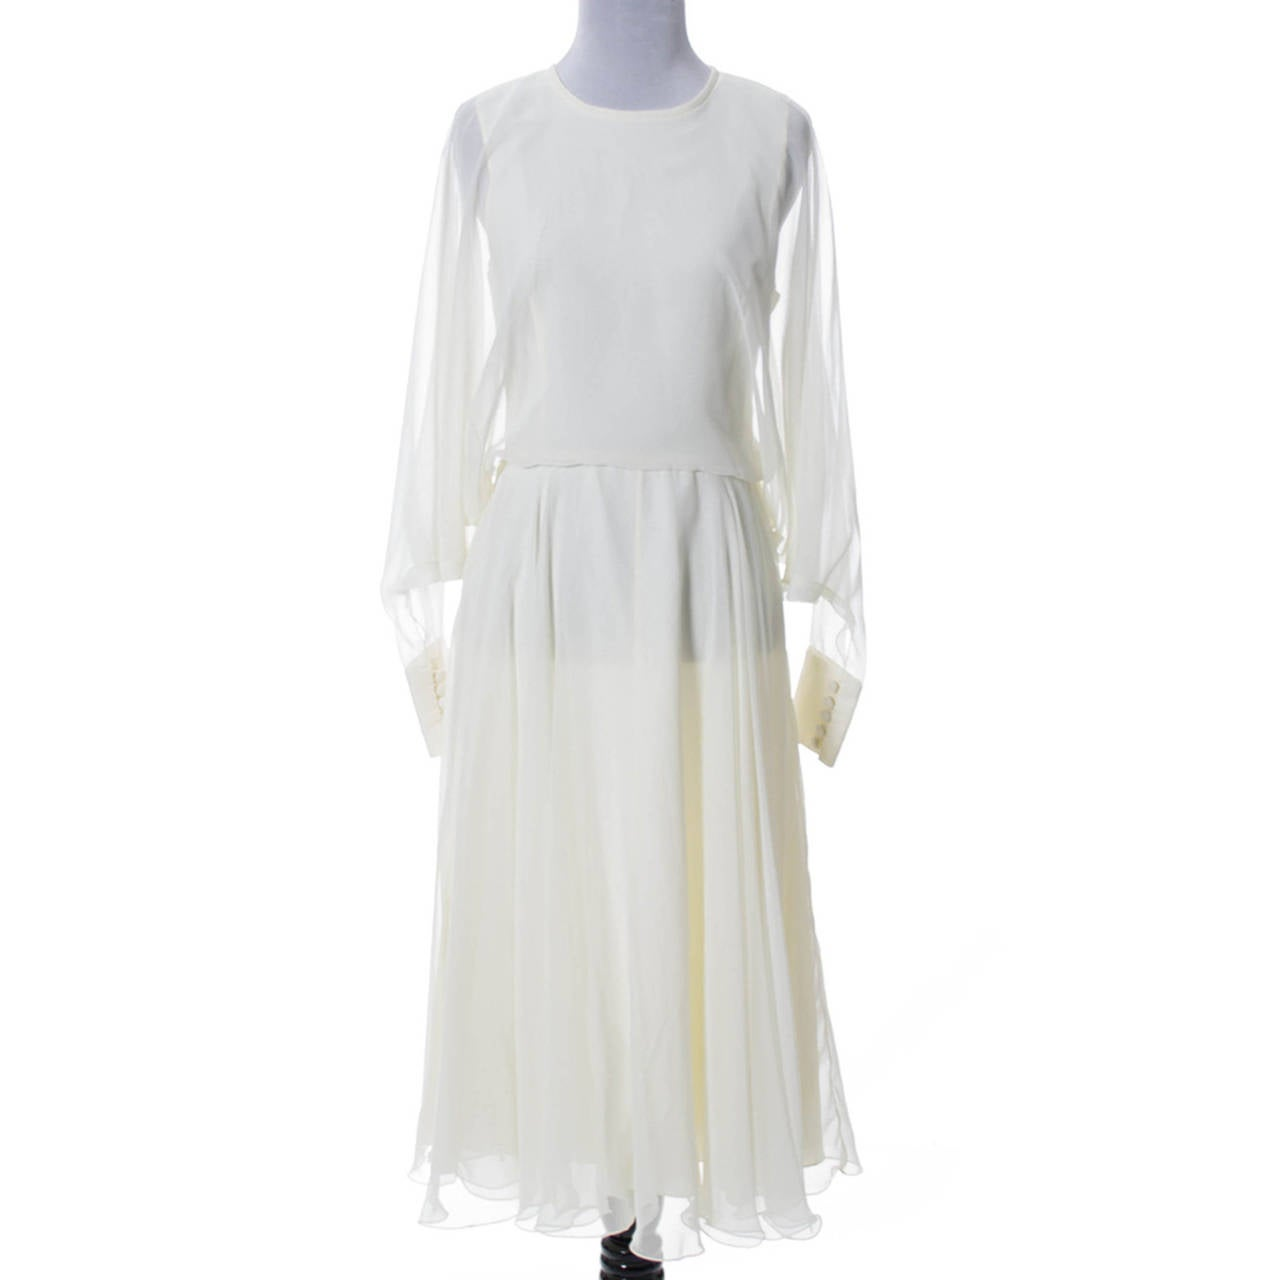 1970s Vintage Jean Varon John Bates Chiffon Designer Dress Batwing Sleeves For Sale 3